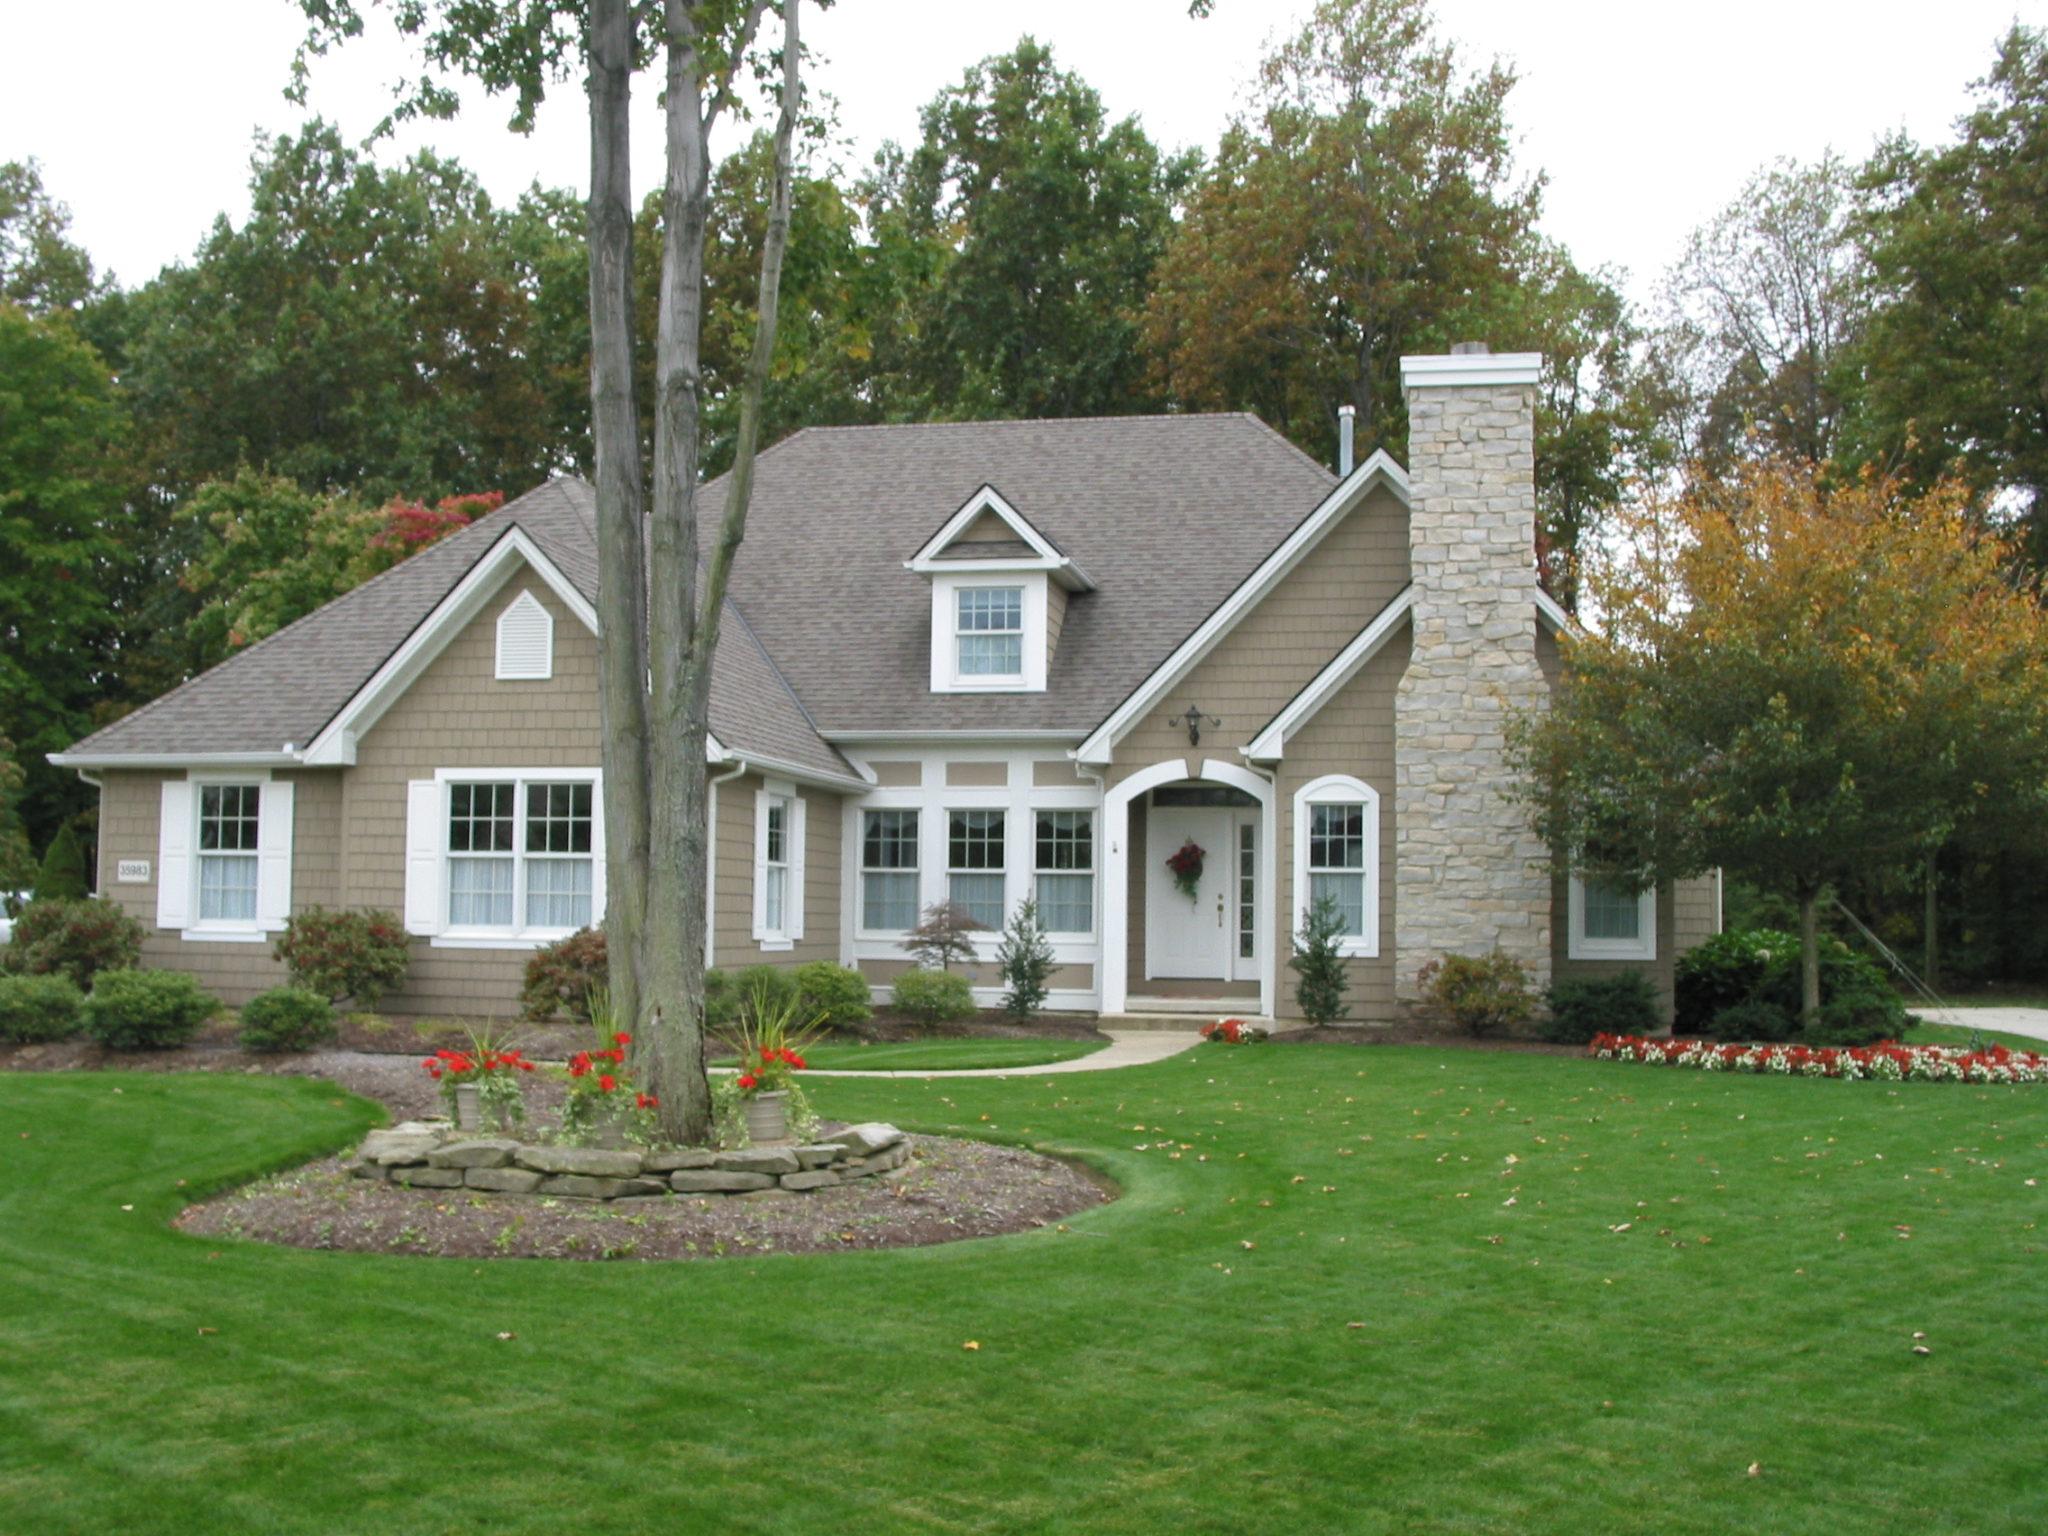 Custom Built Homes in Avon, Ohio from Galik Building